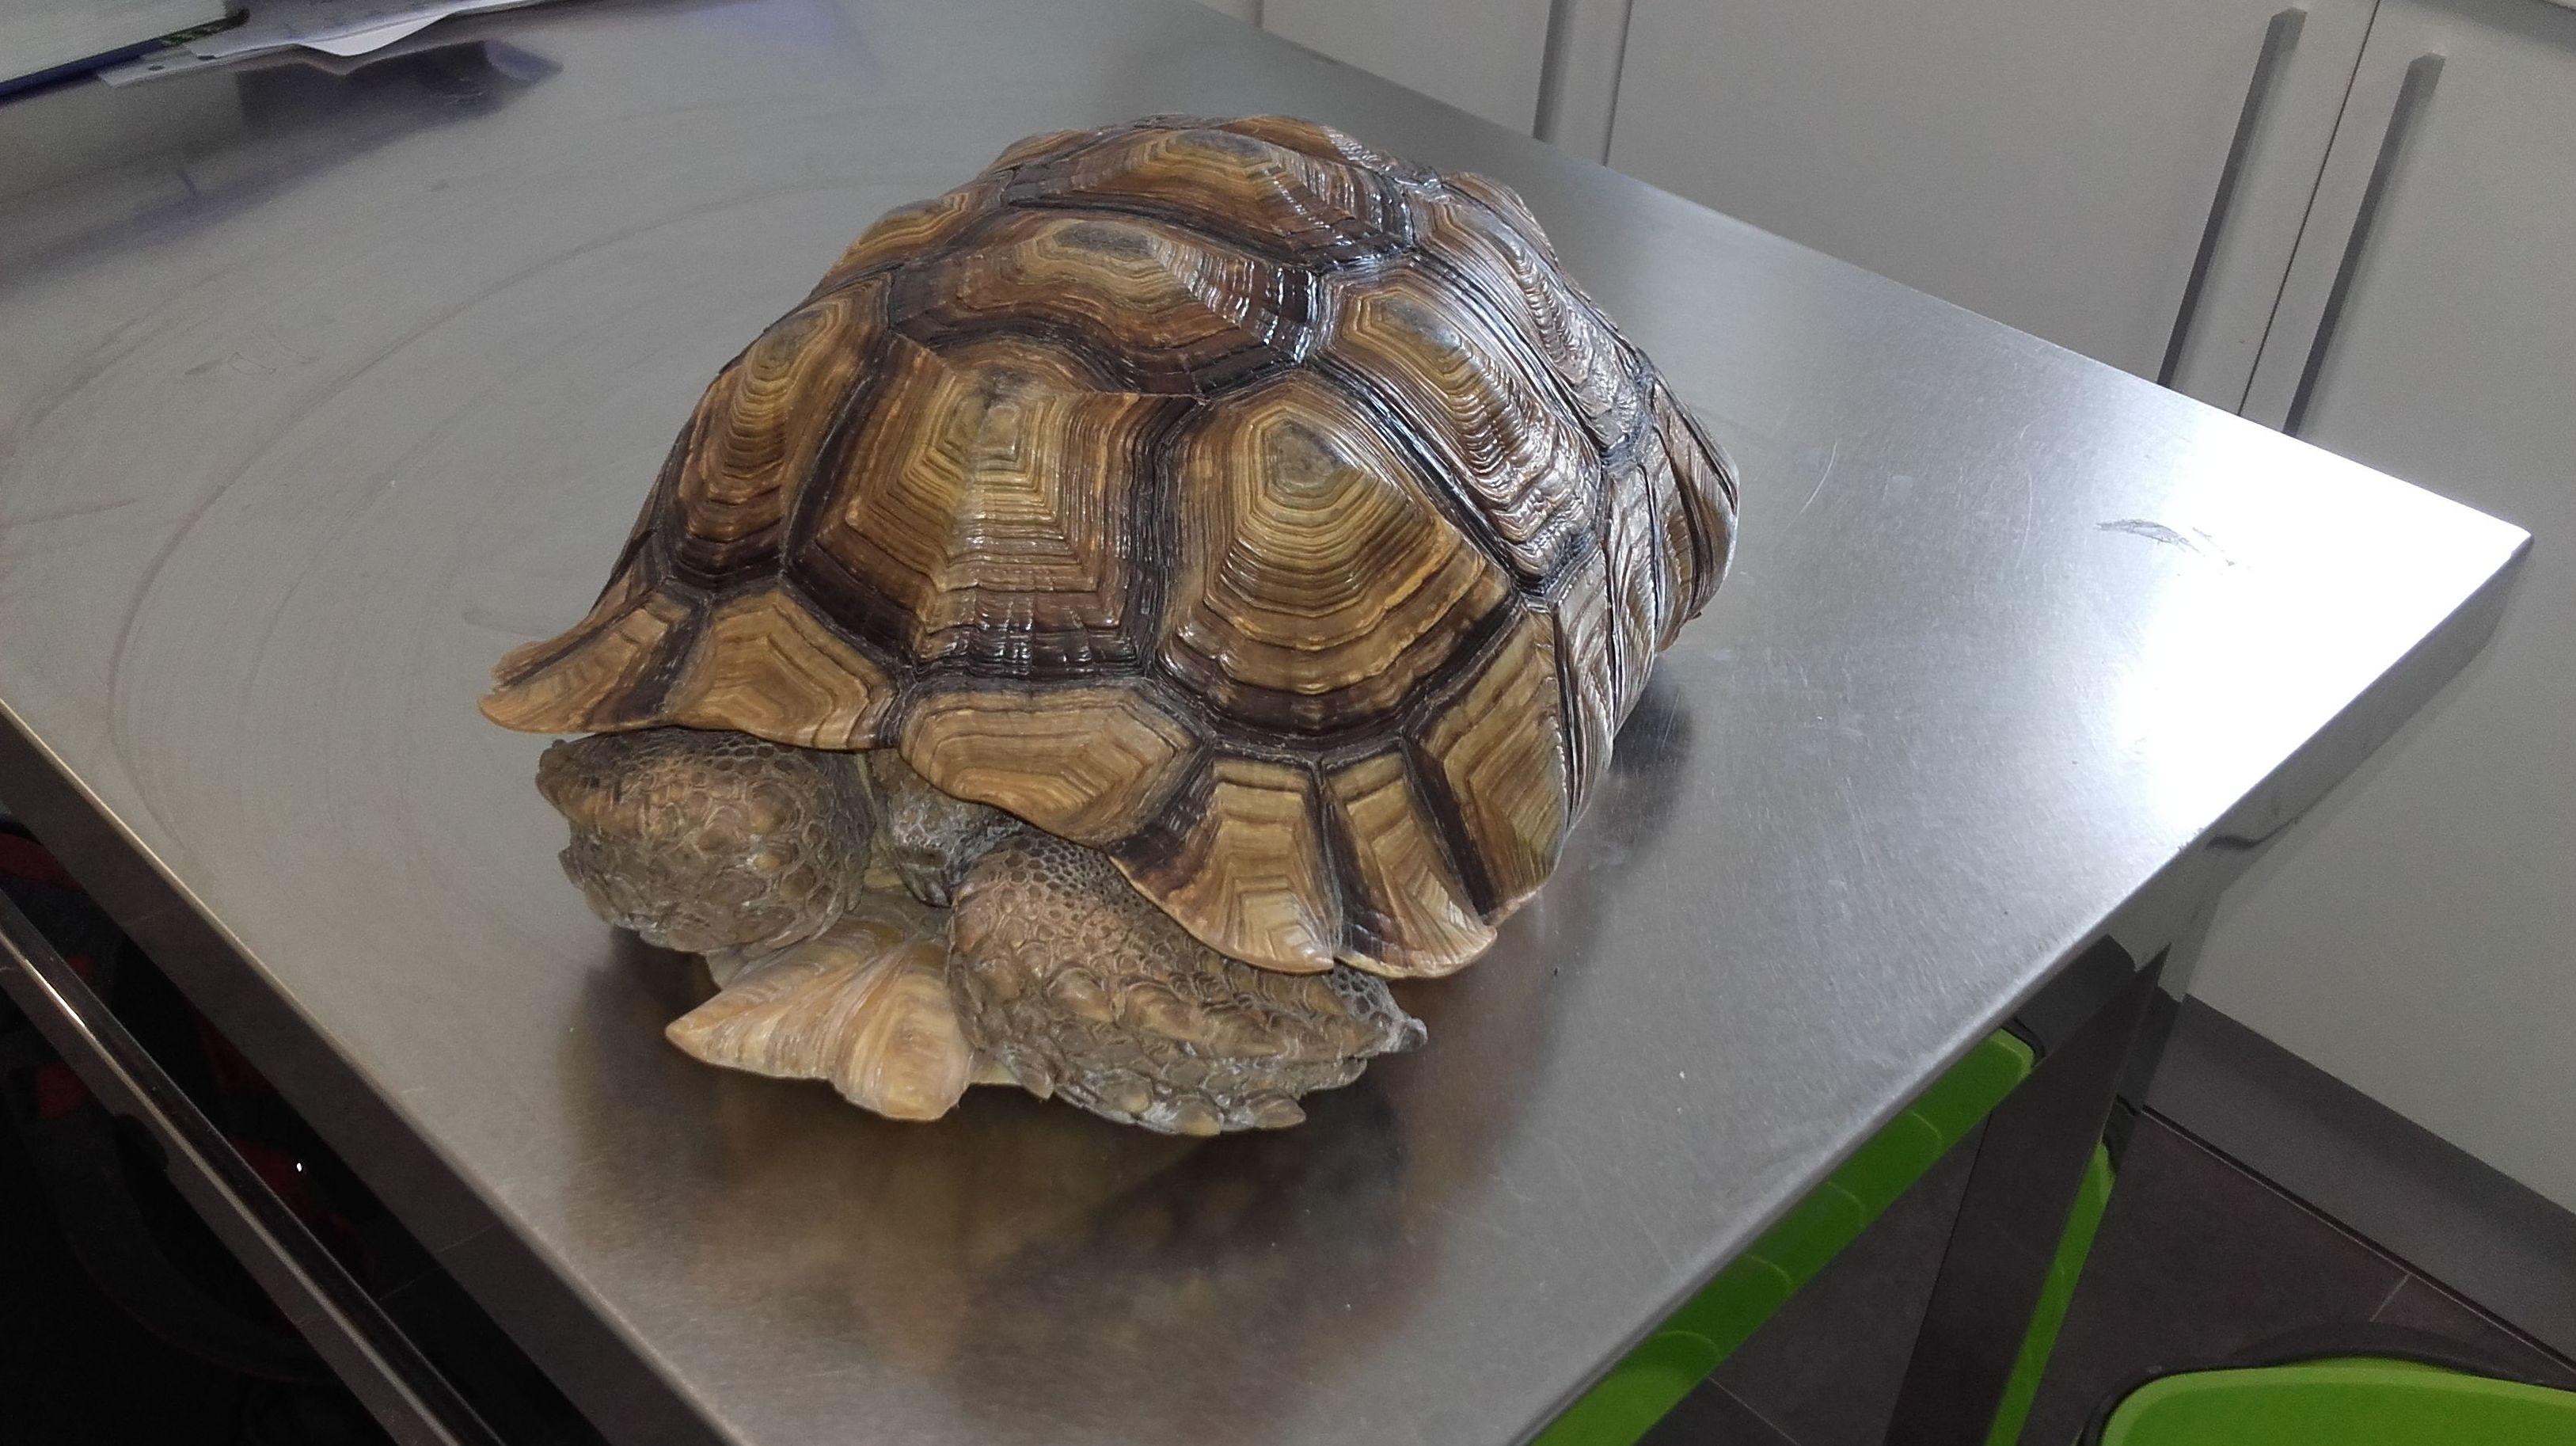 Clinca veterinaria Reptiles tortugas